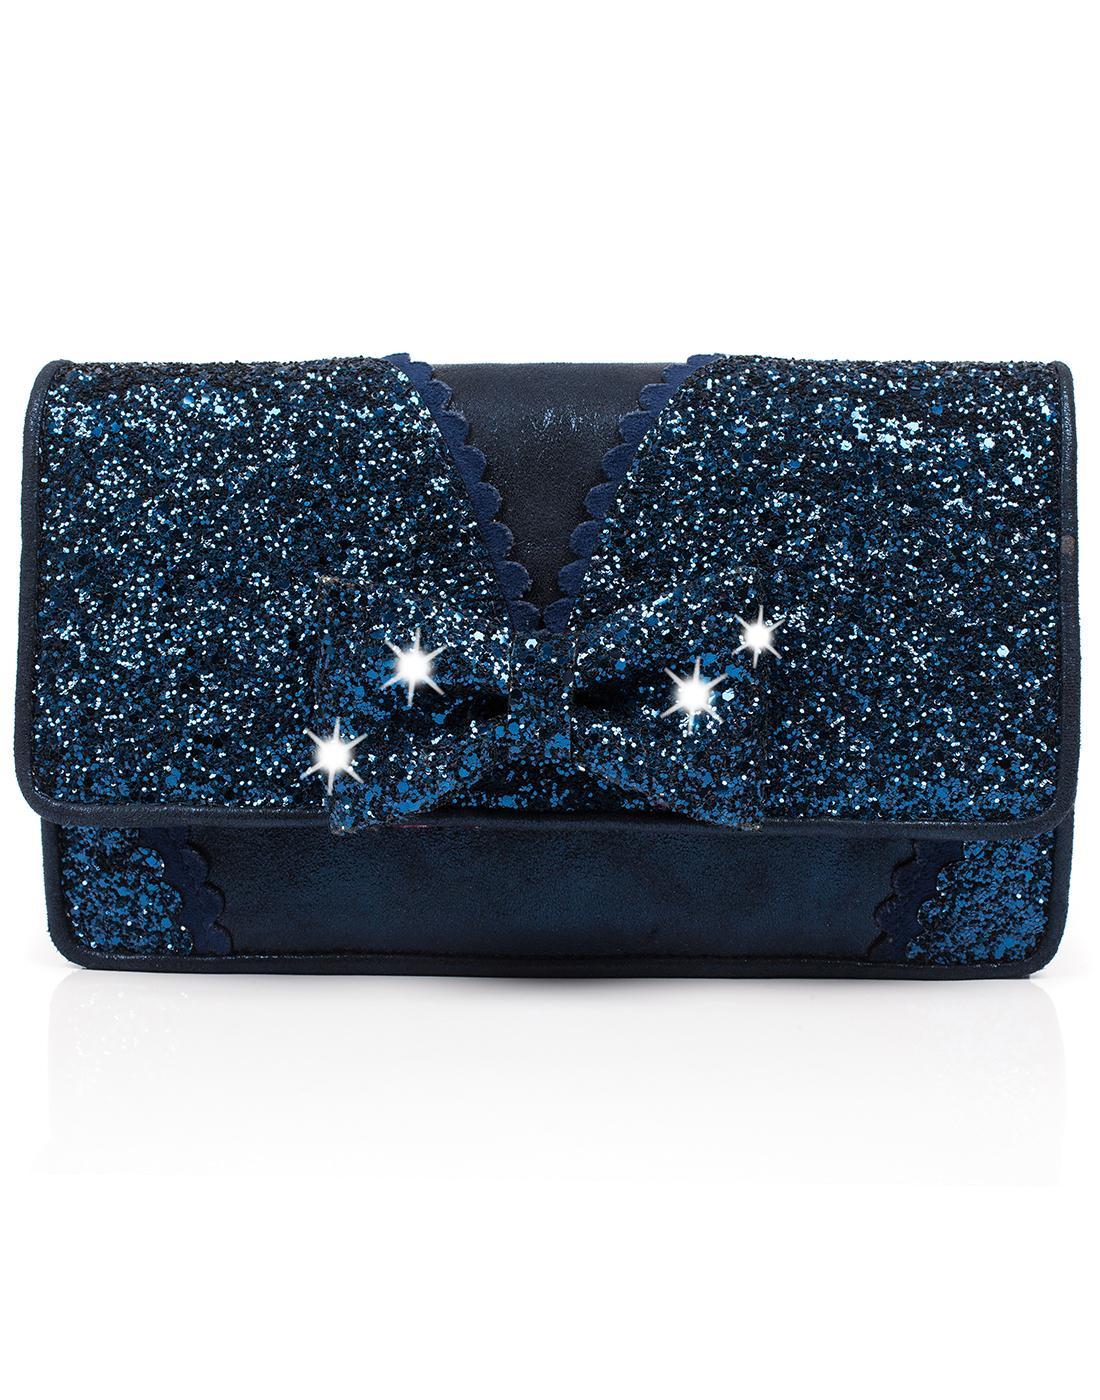 Little Star IRREGULAR CHOICE Light Up Flashing Bag